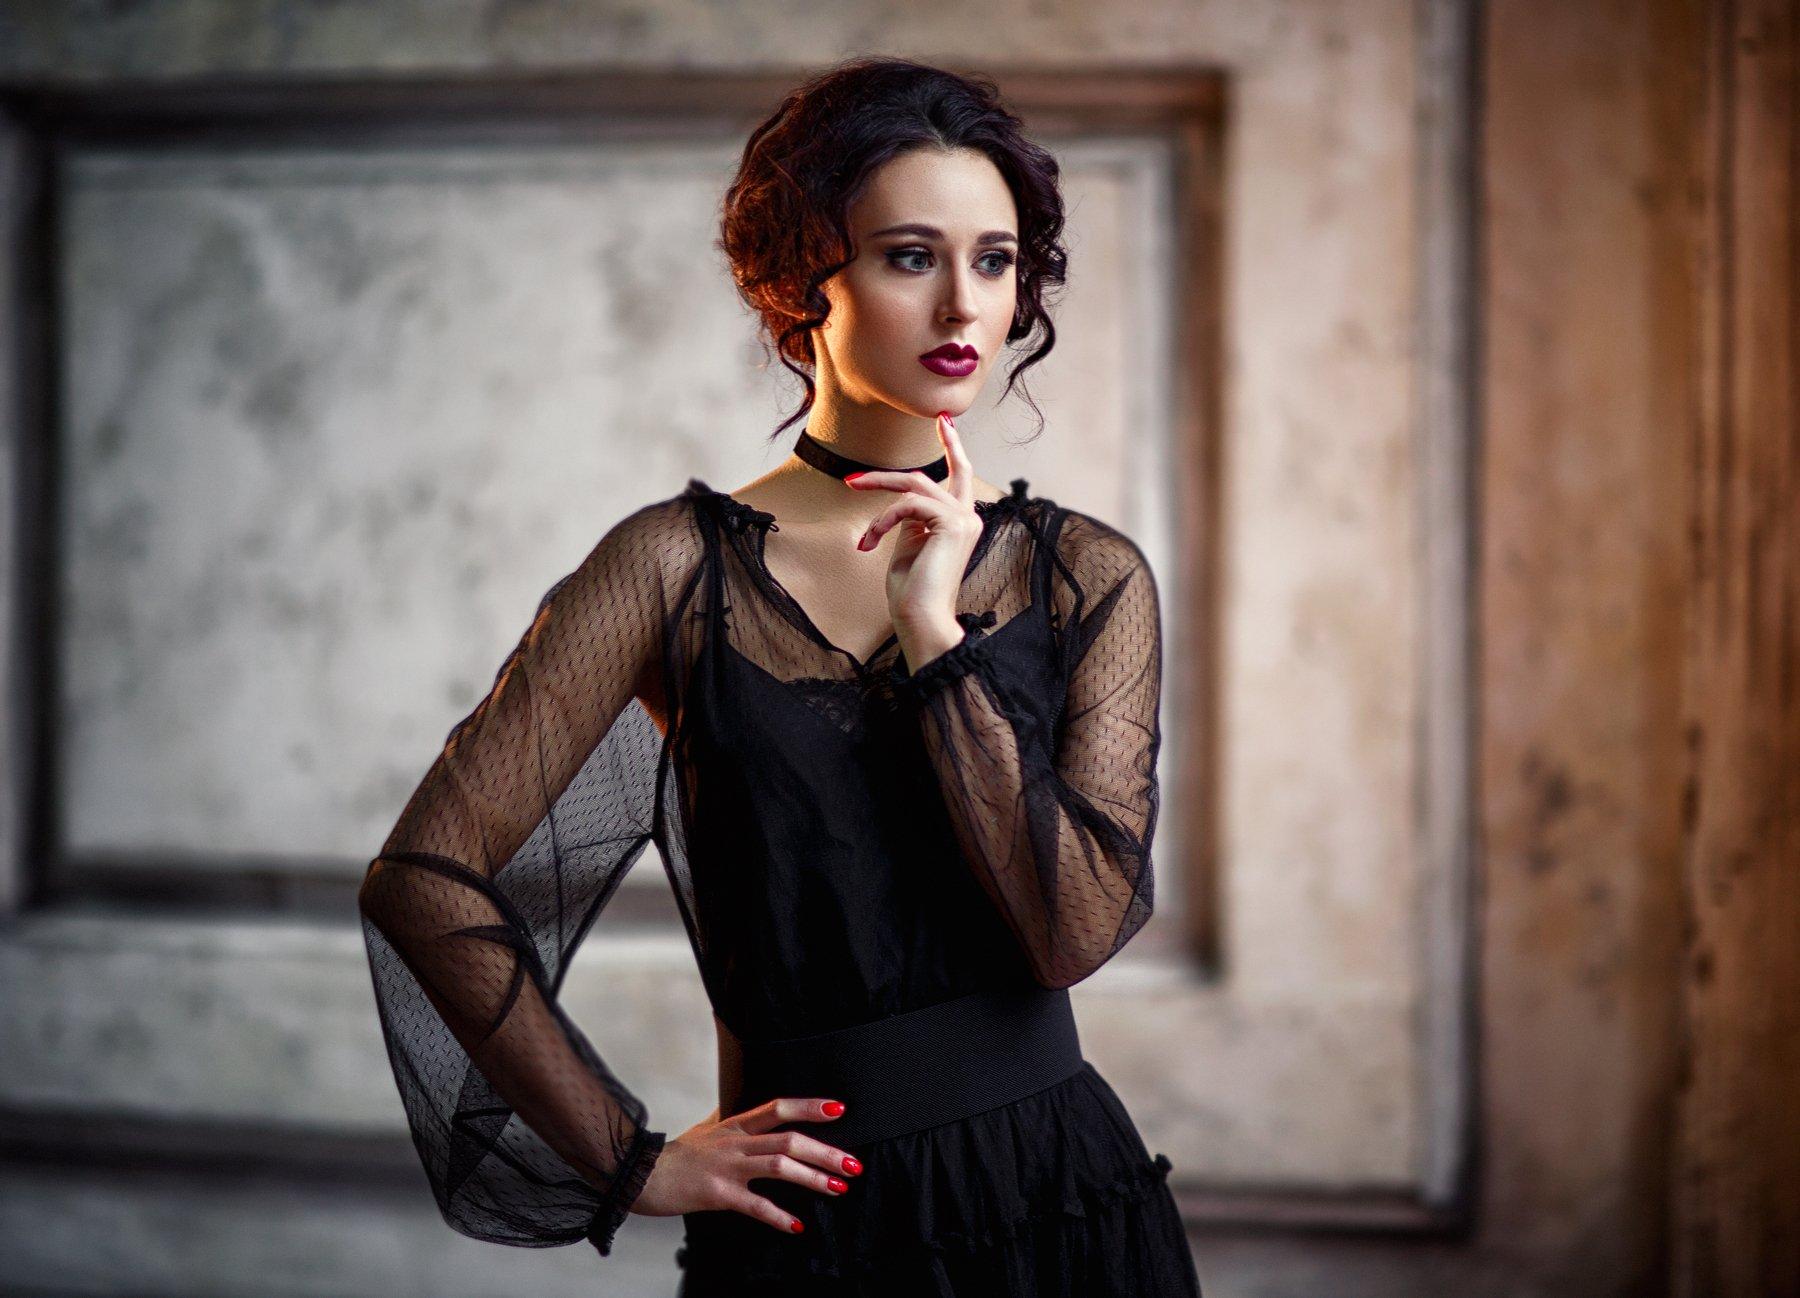 #portrait #beautiful #model #russia #moscow, Hakan Erenler